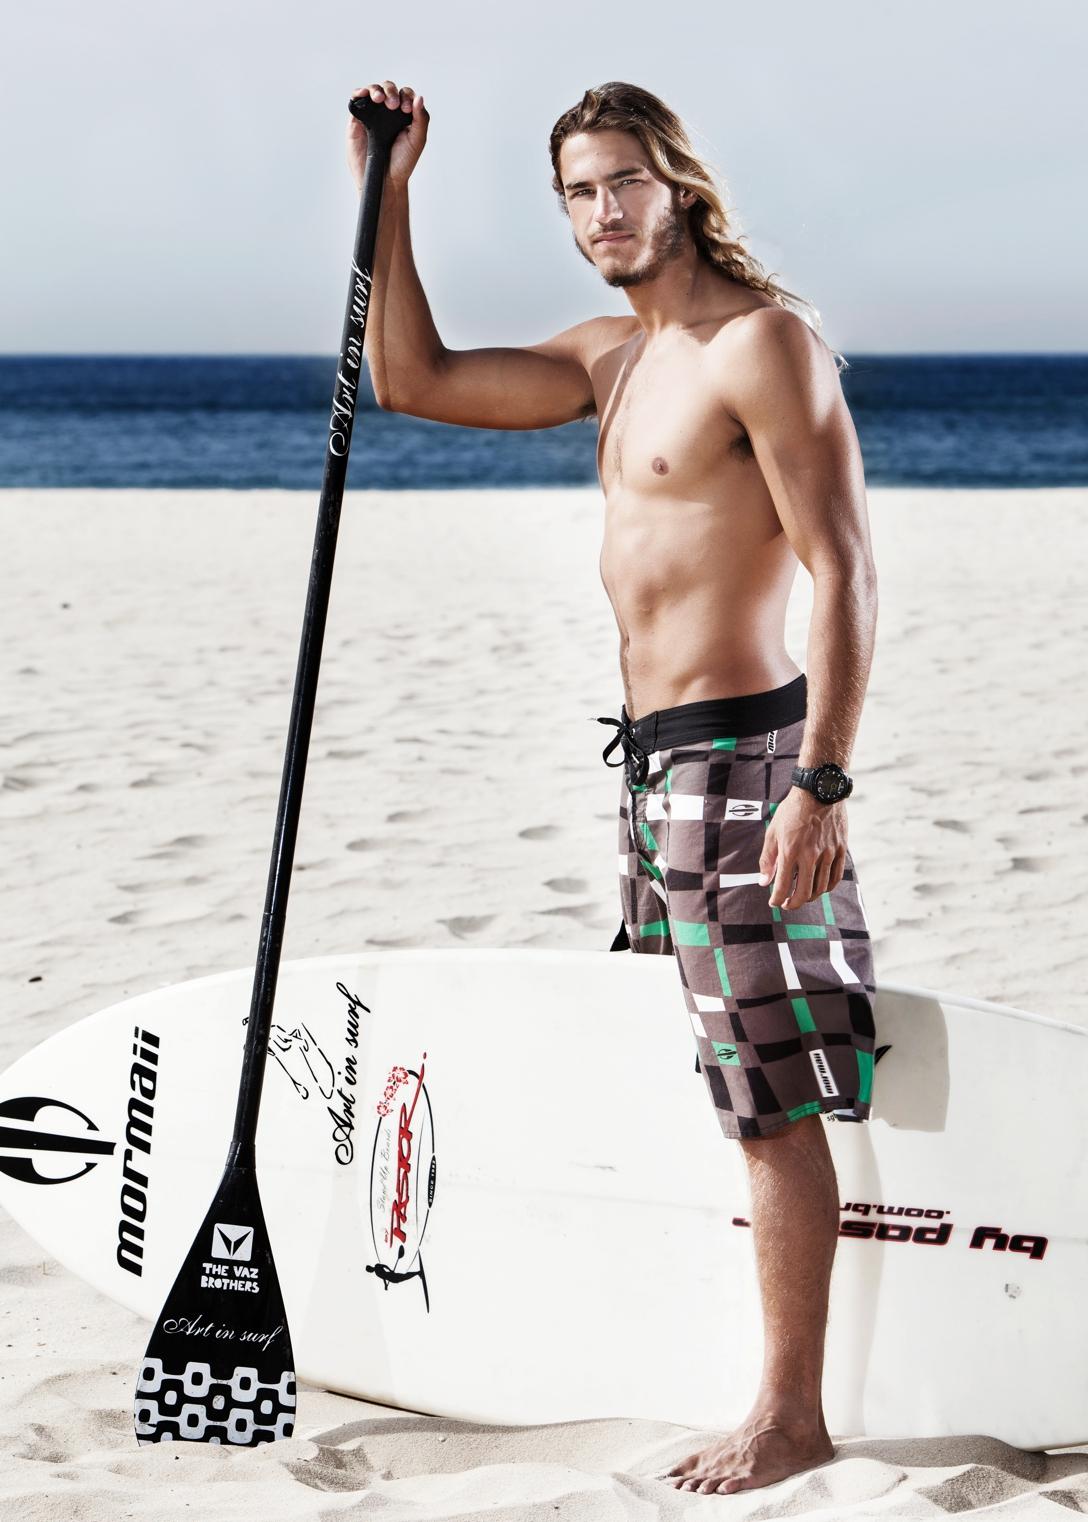 Caio Vaz, surfer